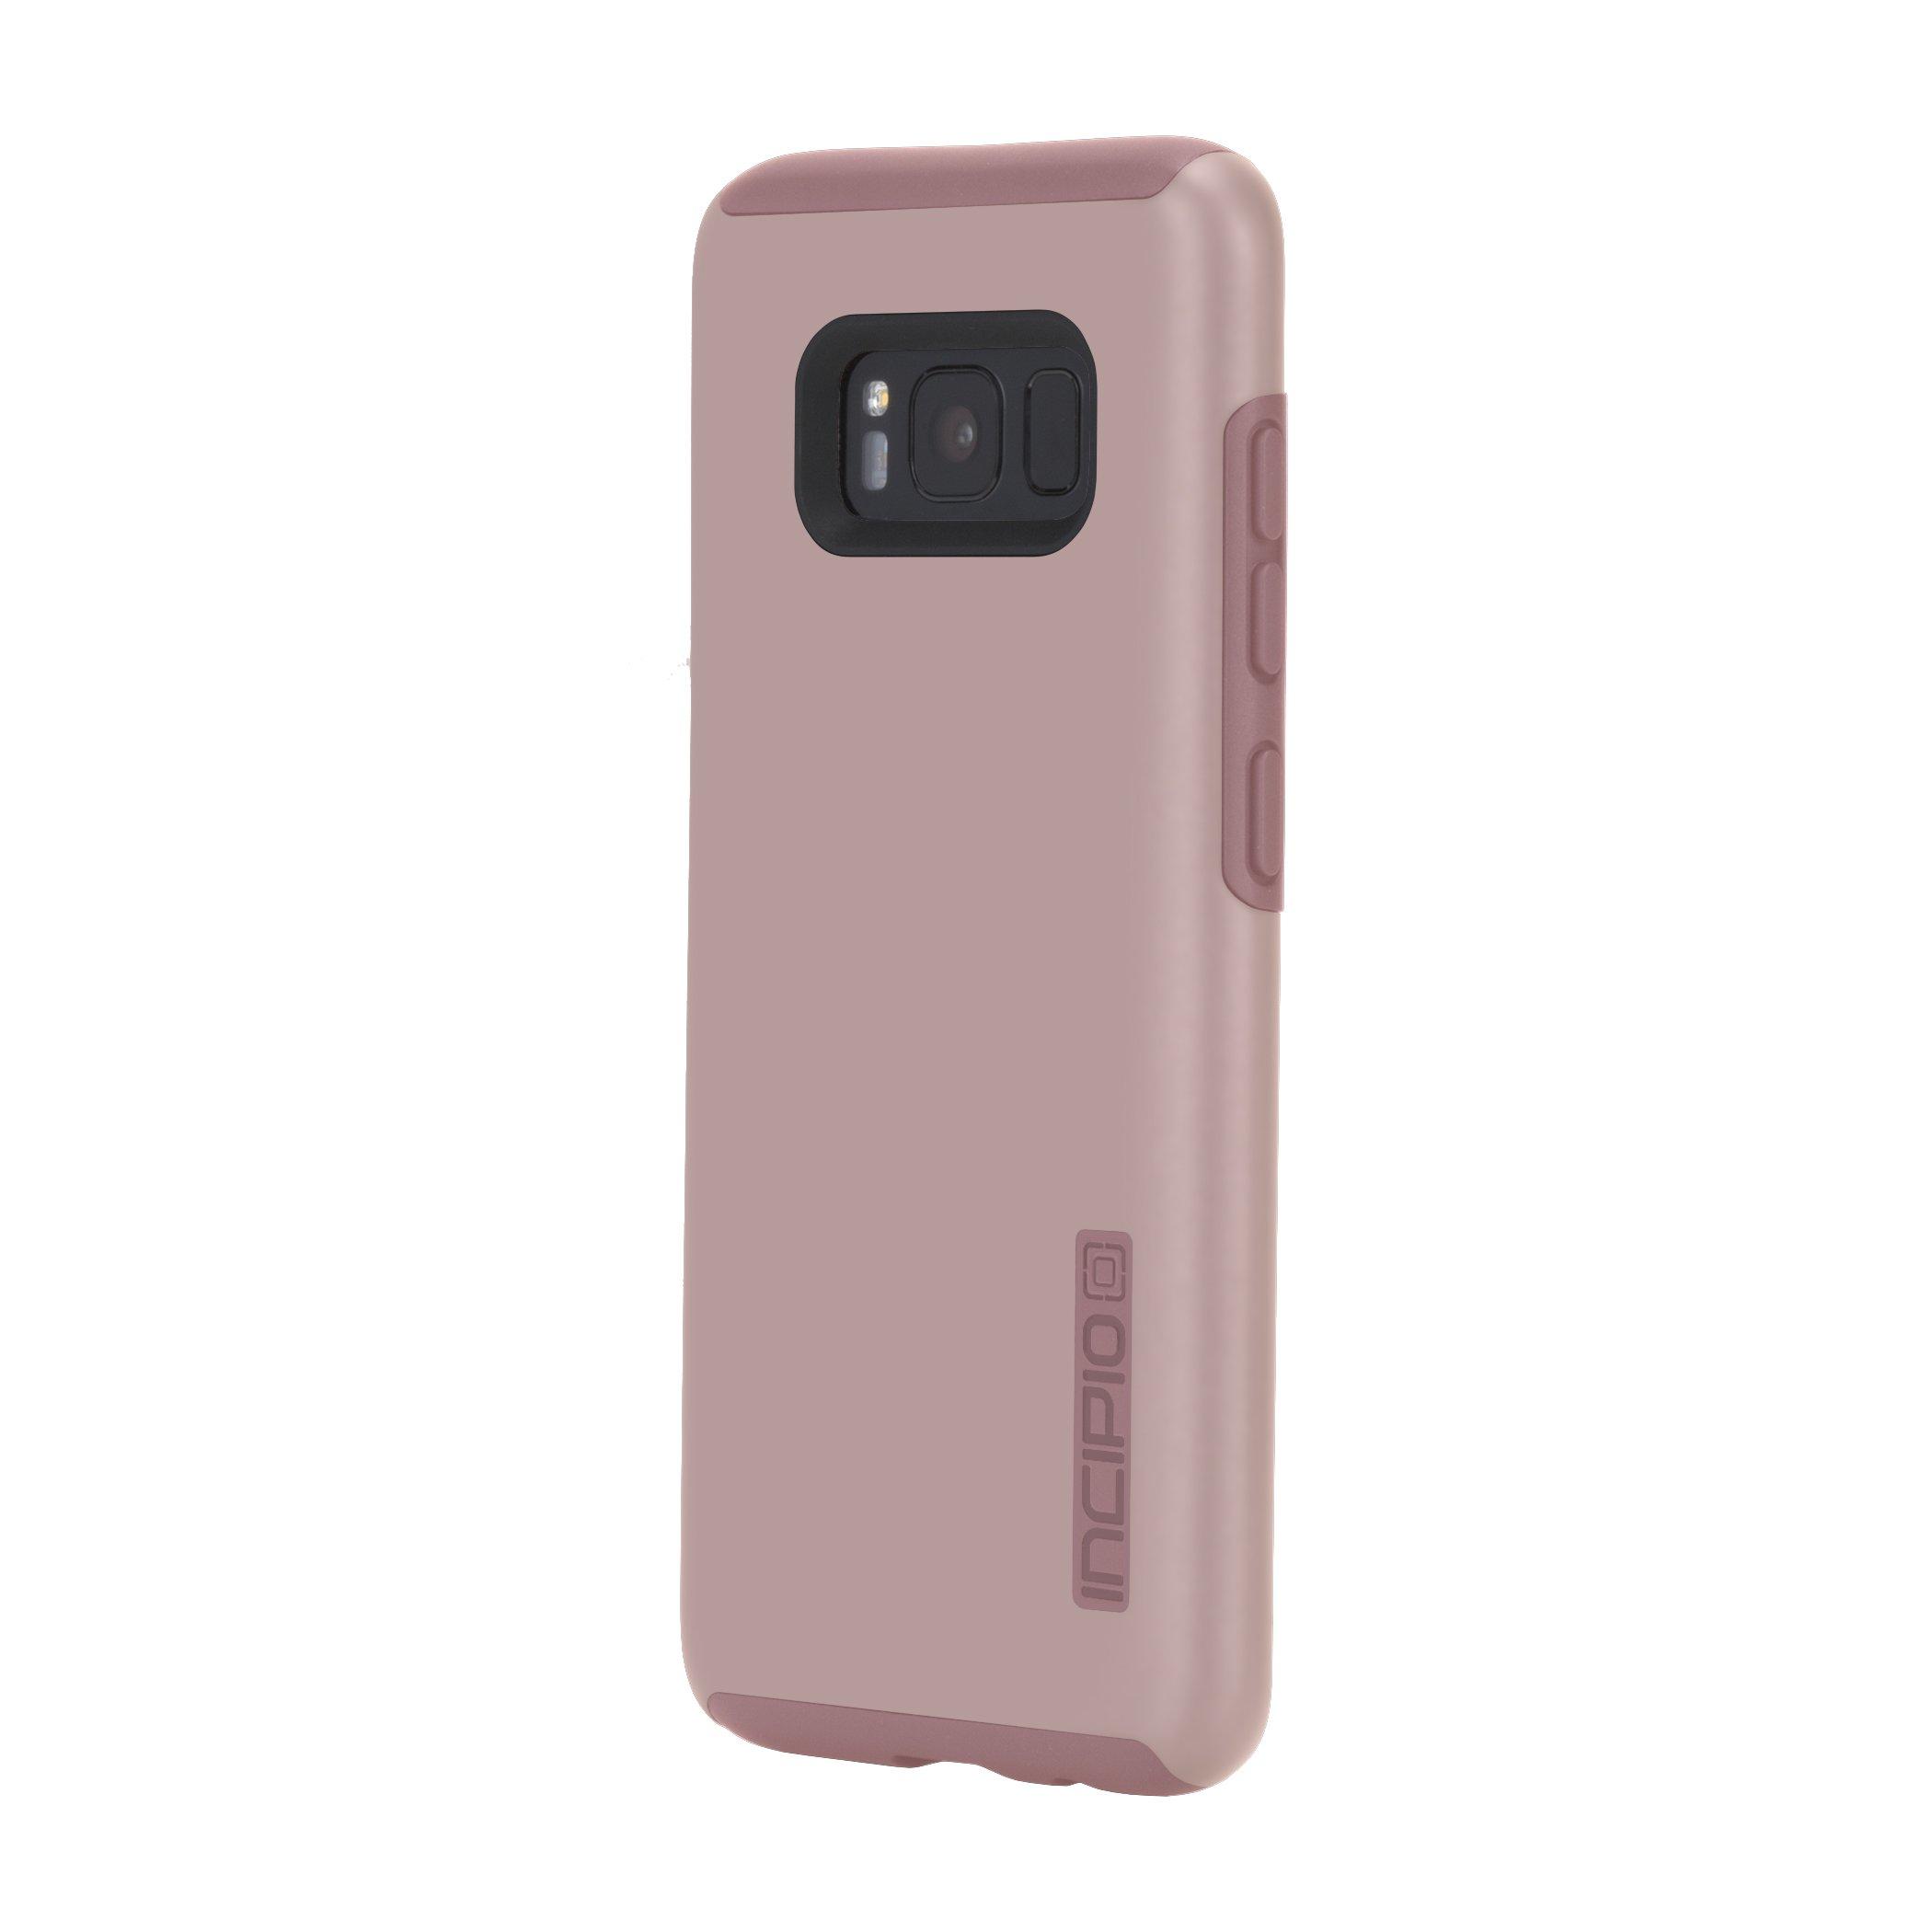 Samsung Galaxy S8 Case, Incipio [Hard Shell] [Dual Layer] DualPro Case for Samsung Galaxy S8-Iridescent Rose Gold